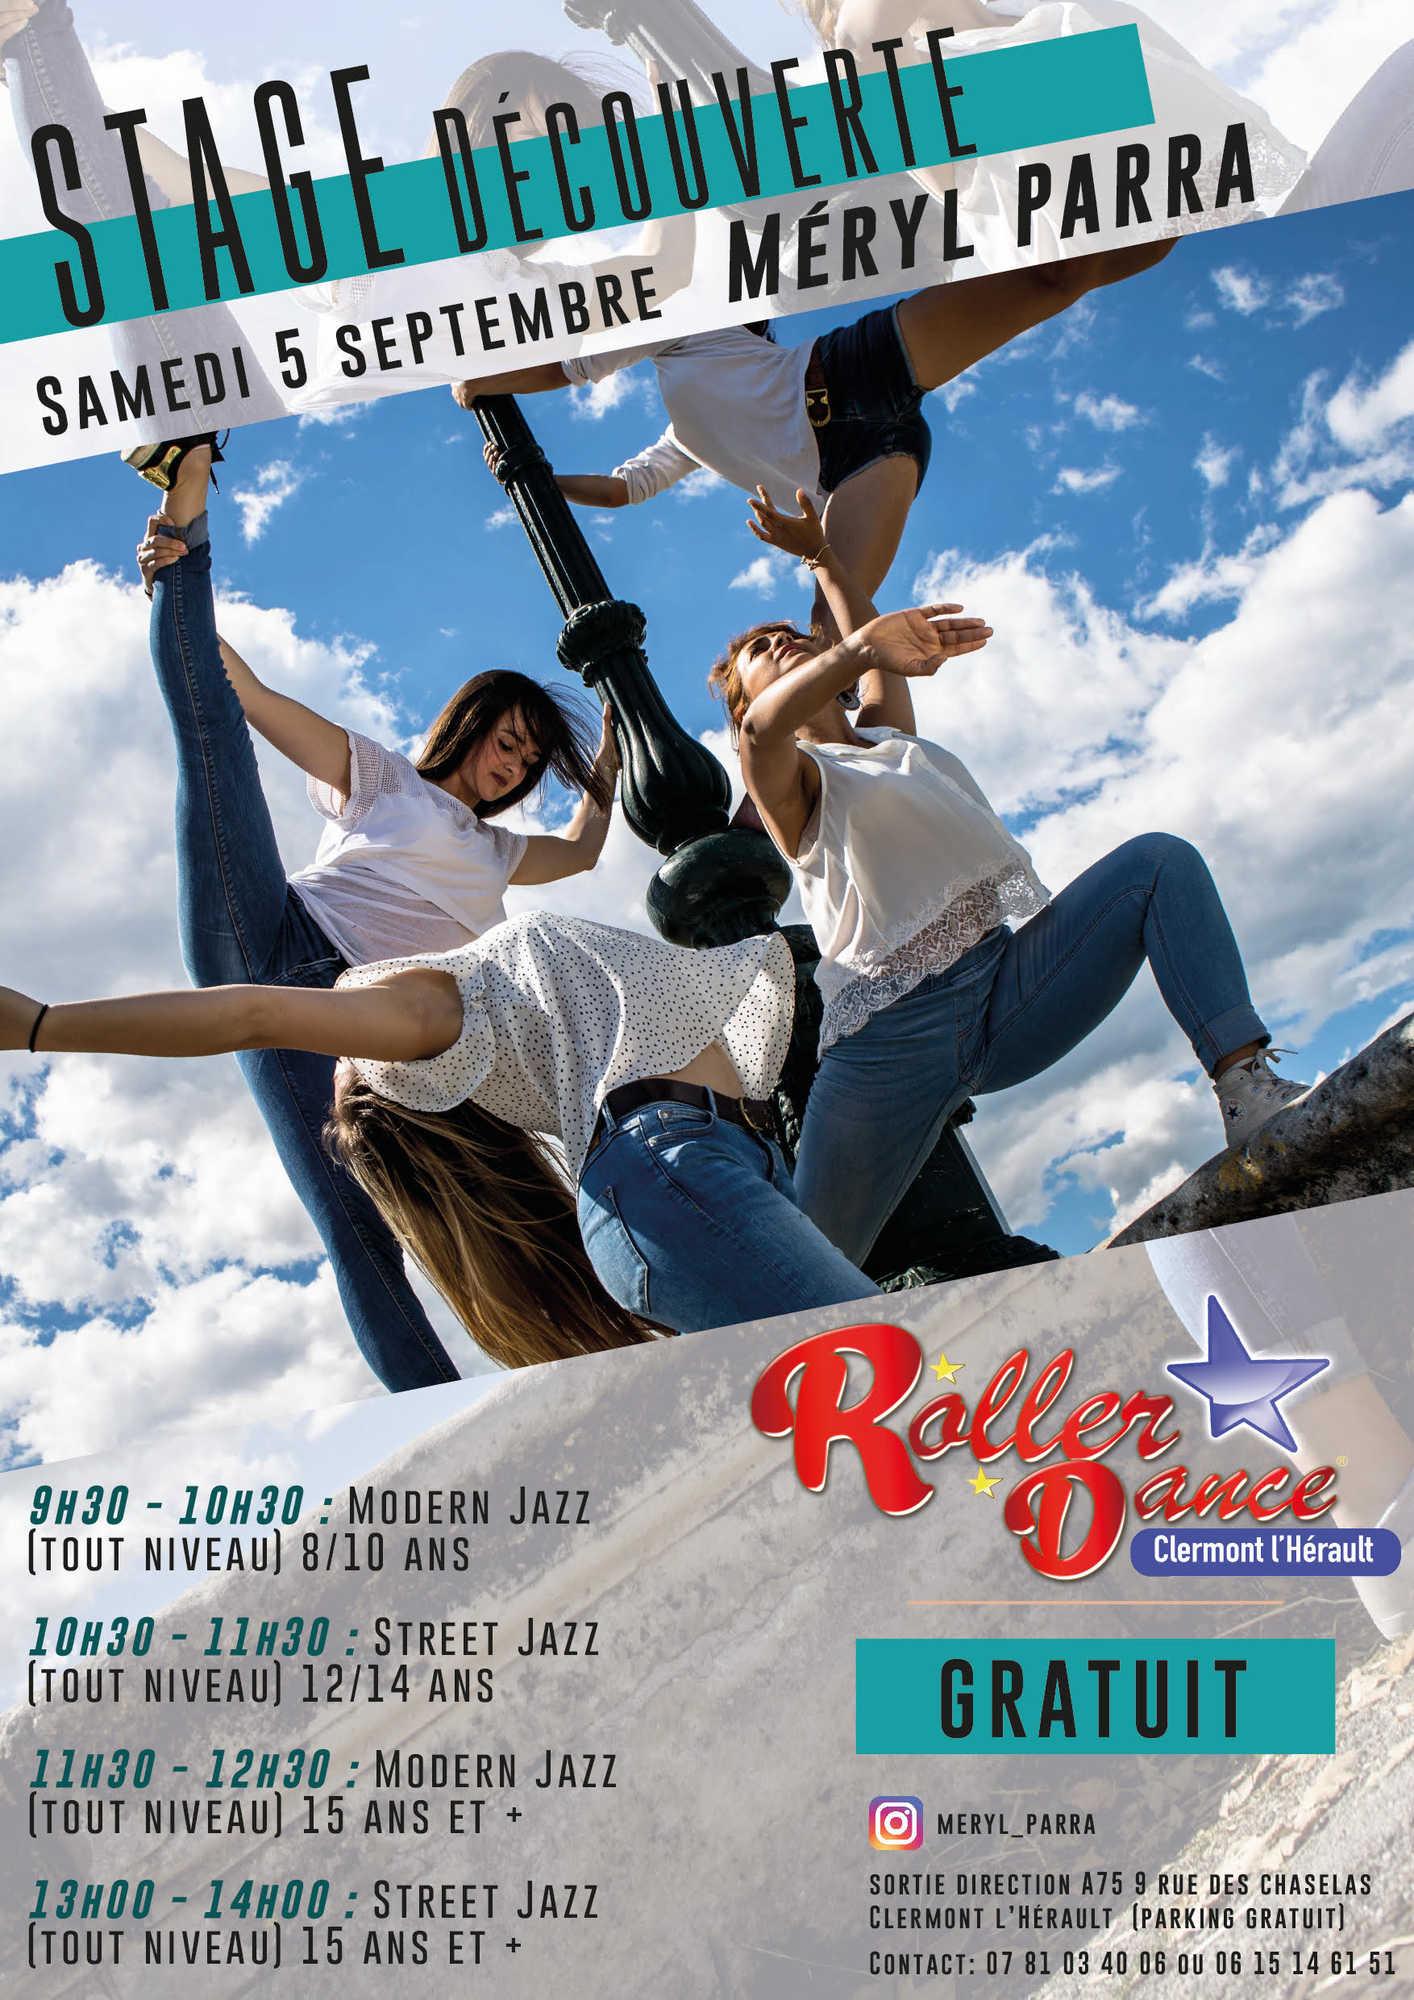 Roller Dance stage decouverte modern jazz street jazz septembre 2020